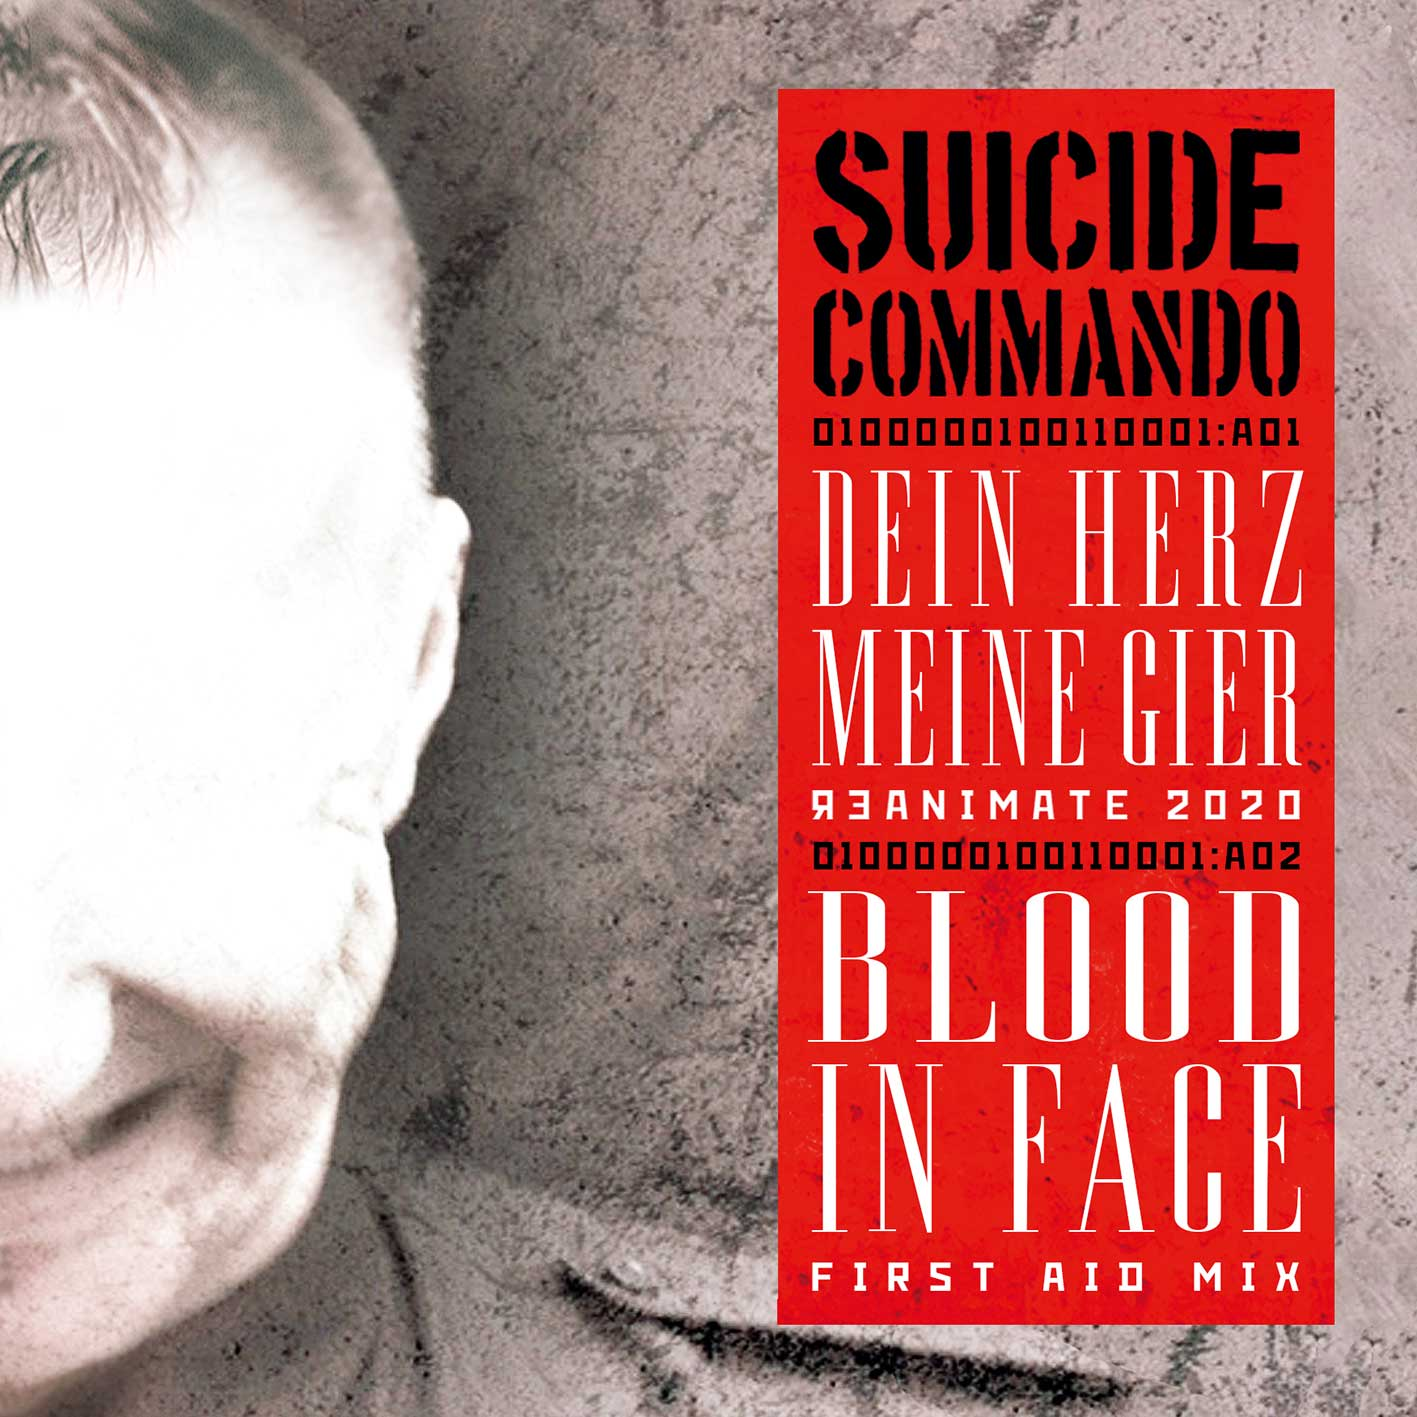 Suicide Commando - Bunkerb!tch - Suicide Commando - Bunkerb!tch